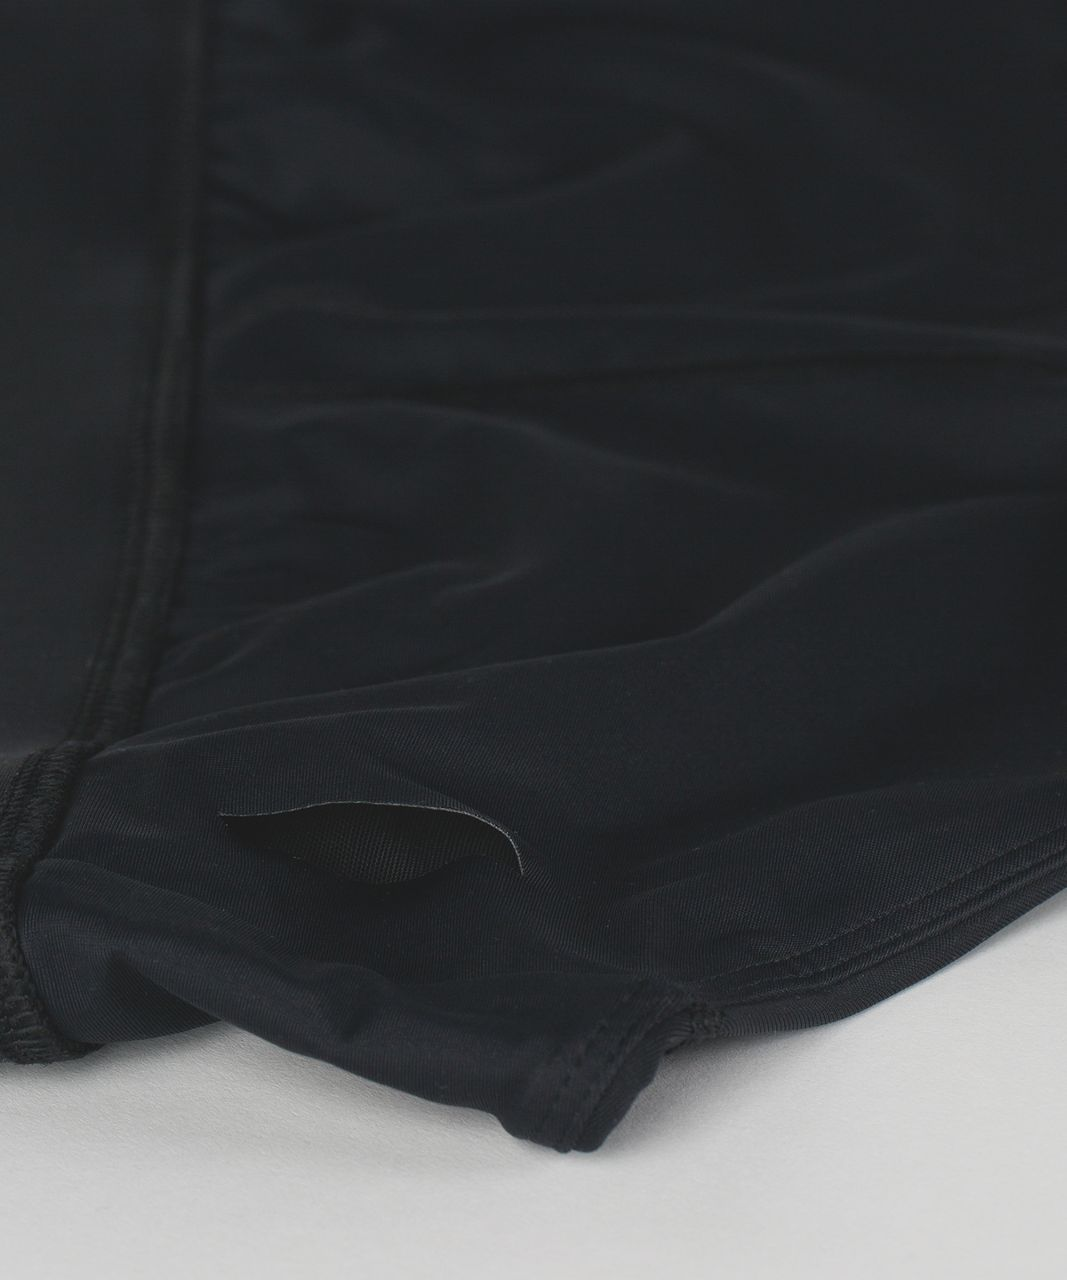 Lululemon Energy Bra (H2O) - Black